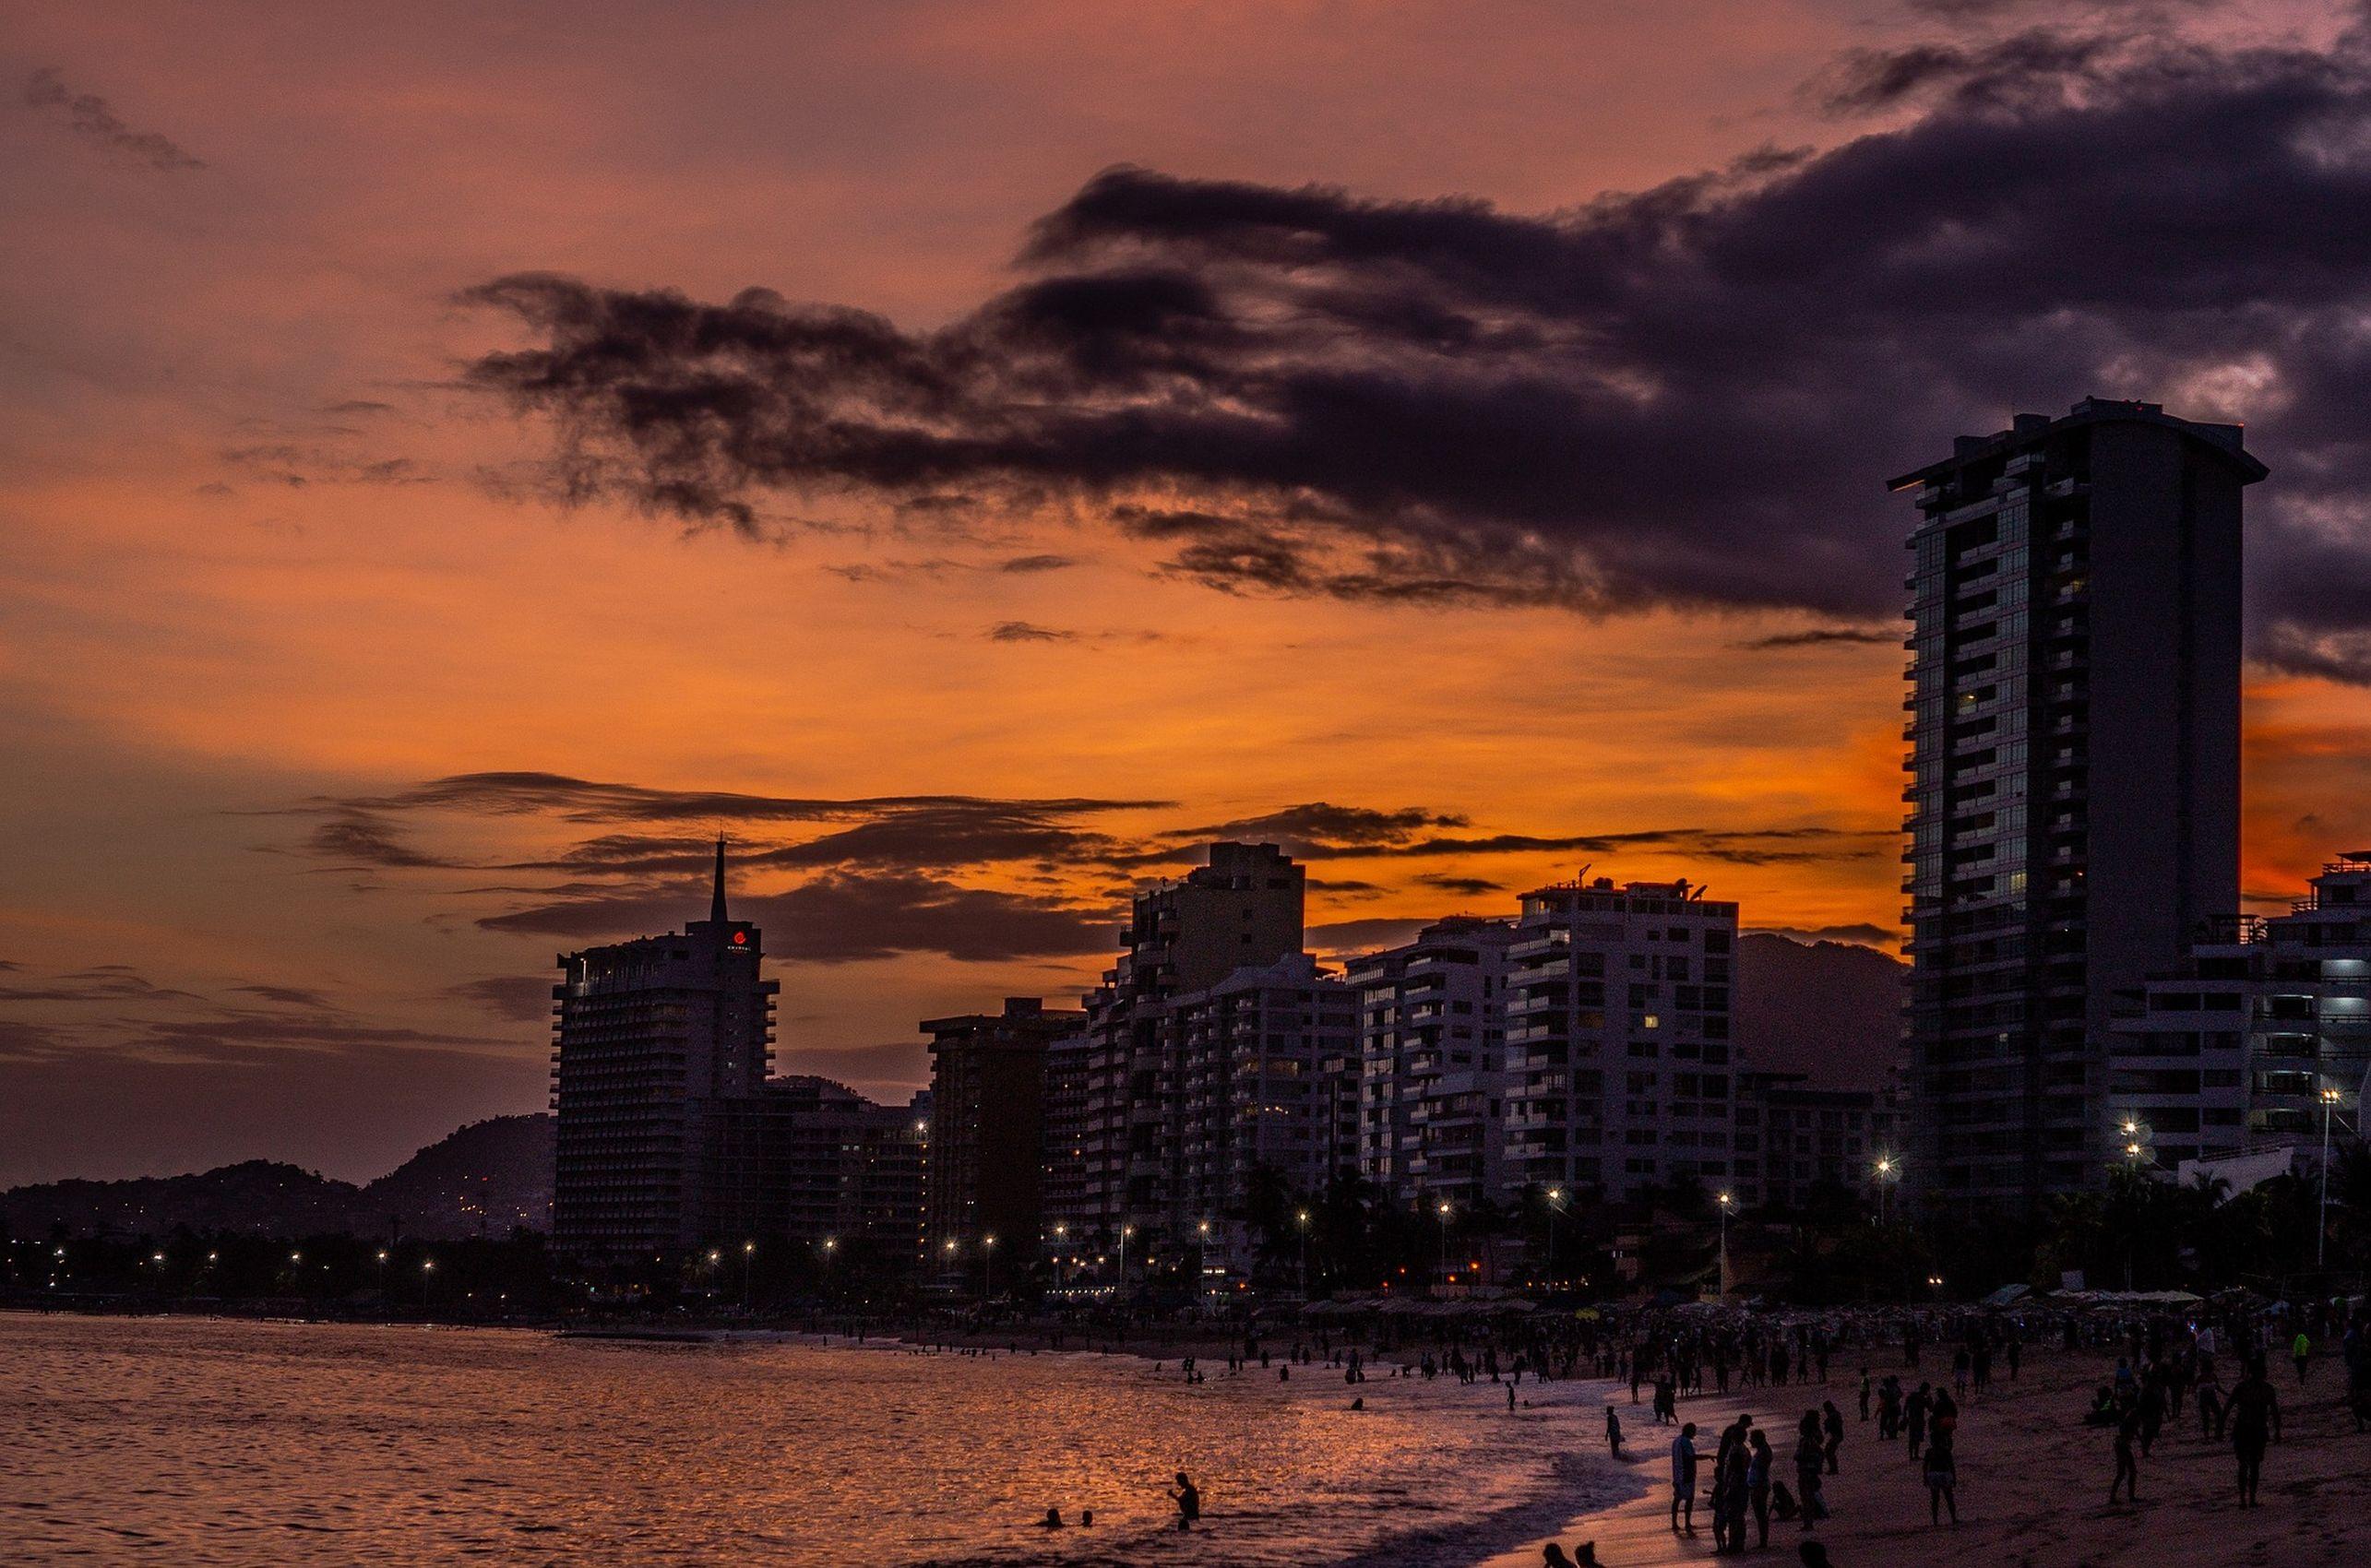 https://bubo.sk/uploads/galleries/3464/acapulco-3605301_1920_vysledok.jpg